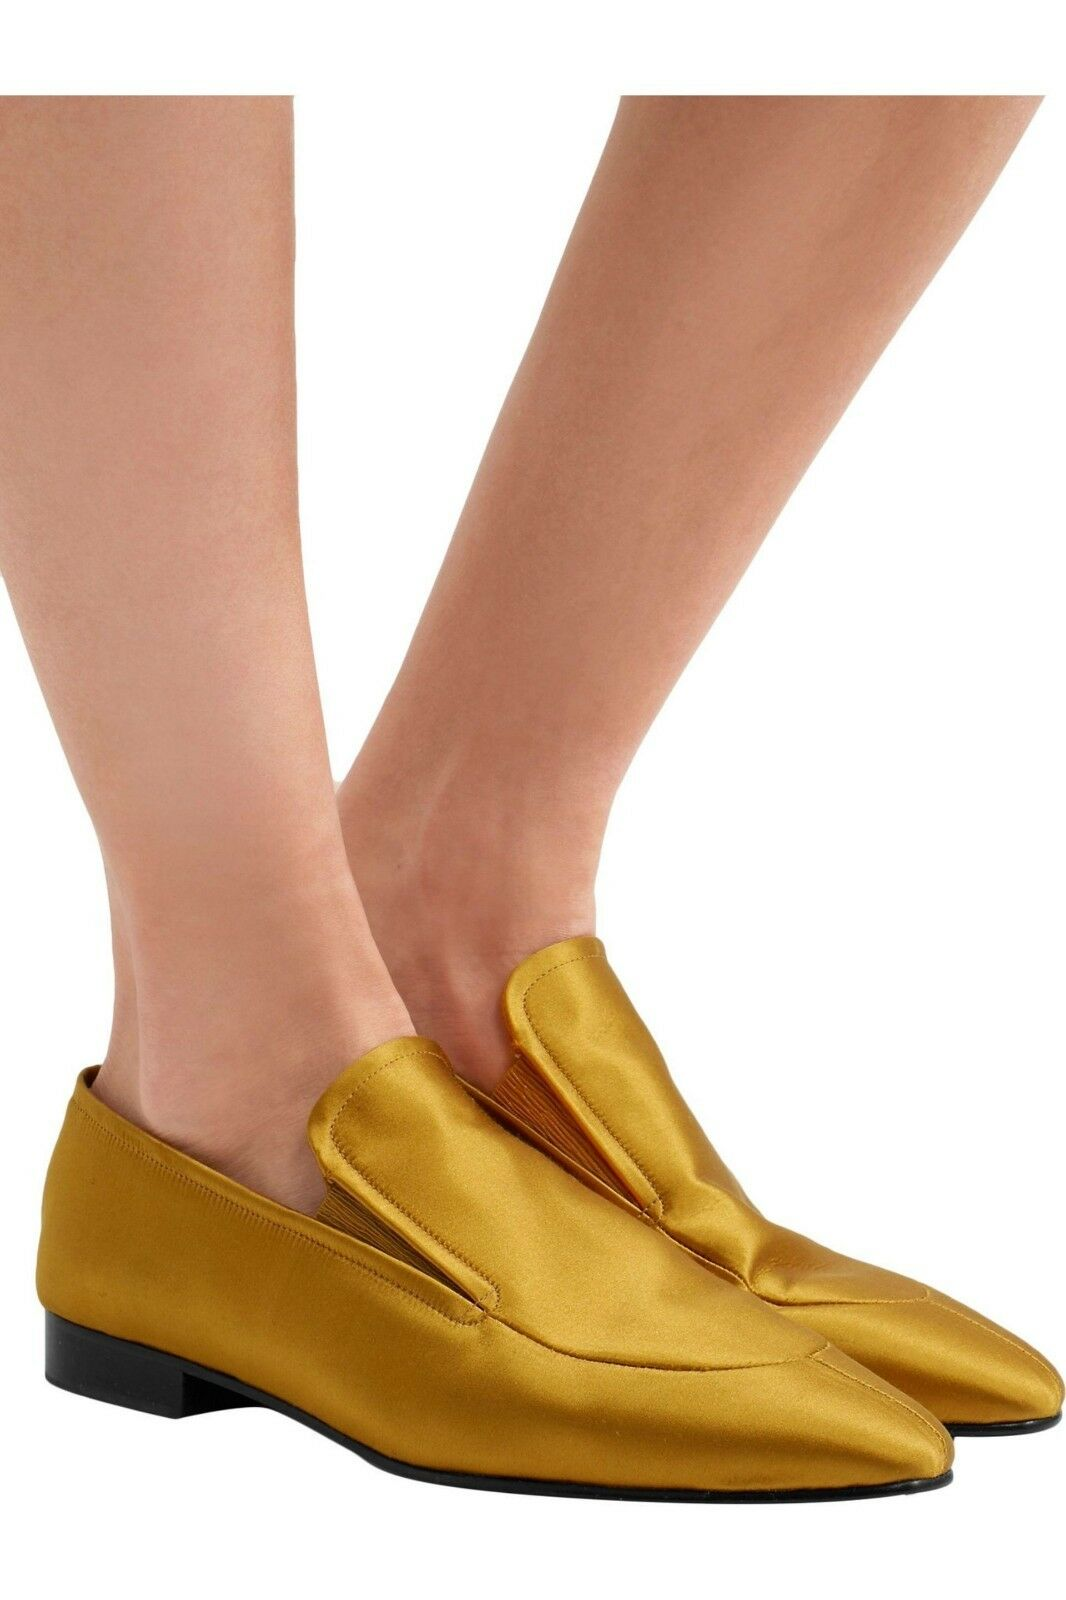 Nuevo  530 Josephs para Mujer satinado anthropologie 9 Caléndula Mocasines Zapatos Talla 39 9 anthropologie Italia 5b04e1